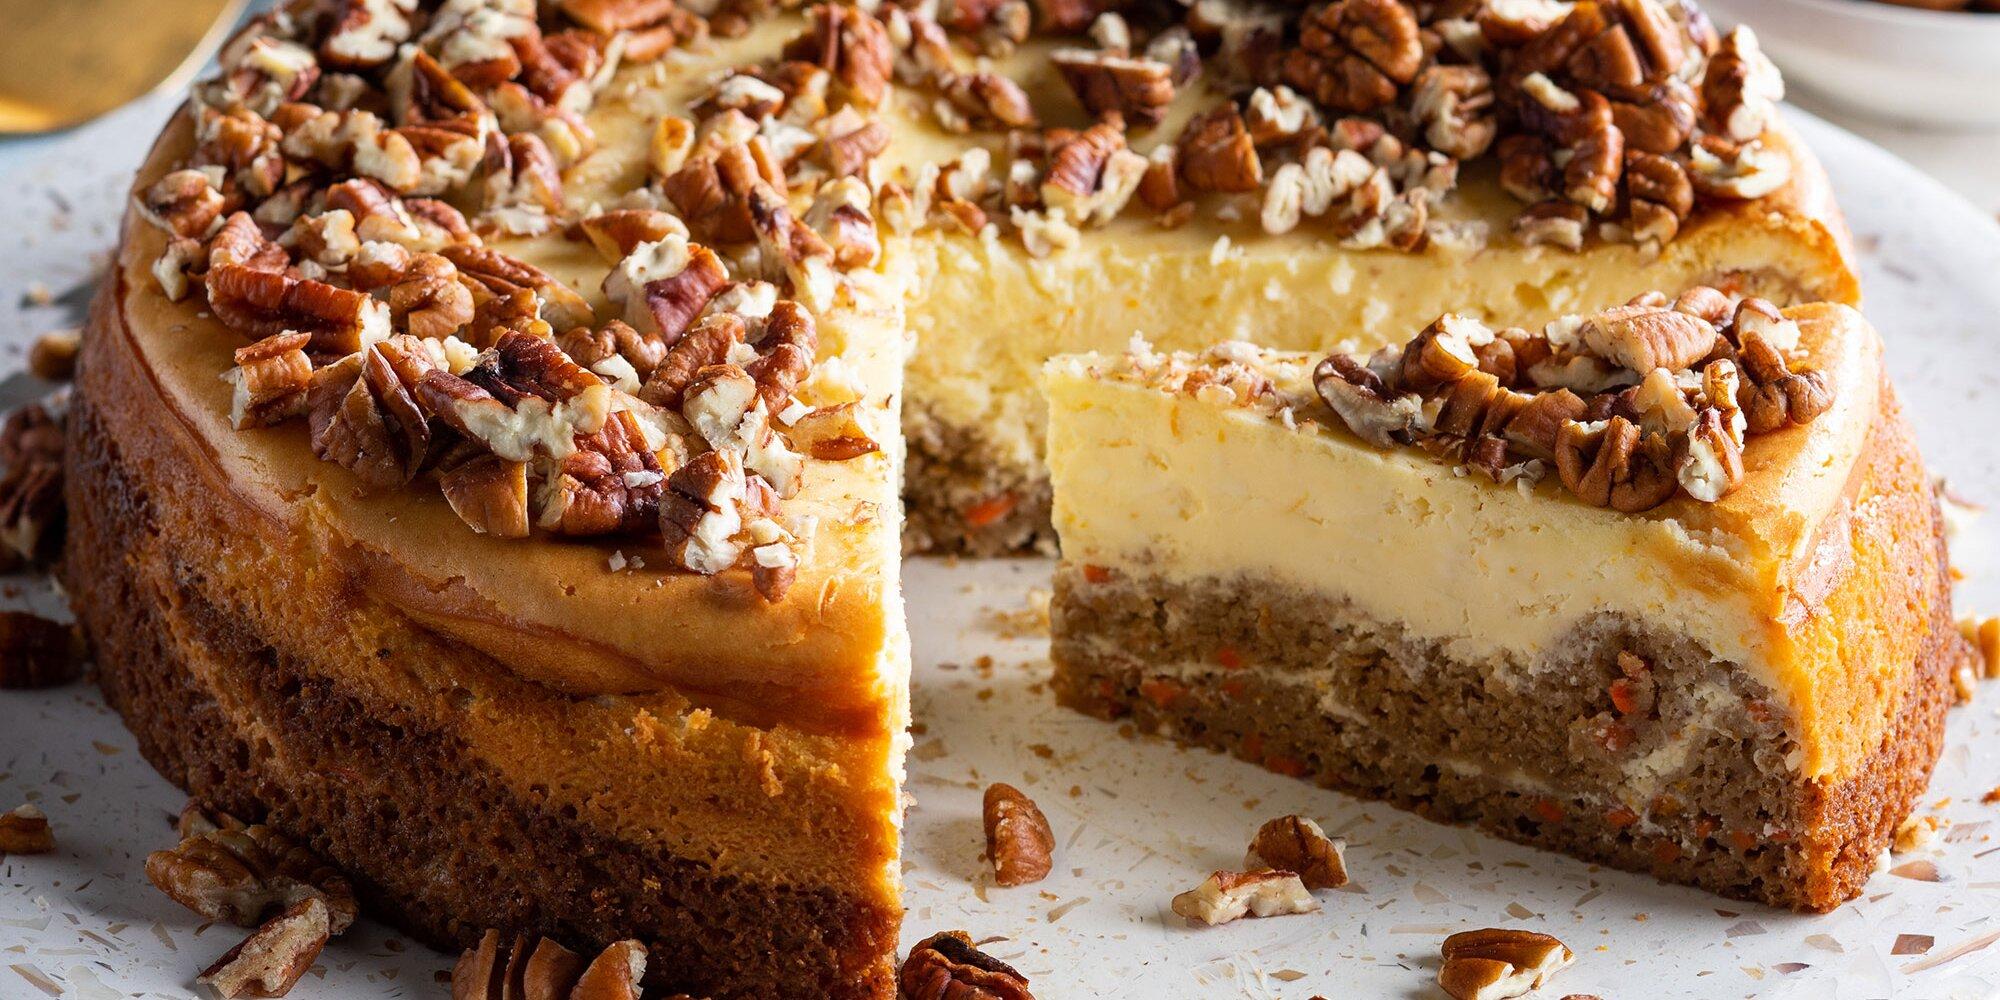 Cheesecake: Carrot Cake Cheesecake